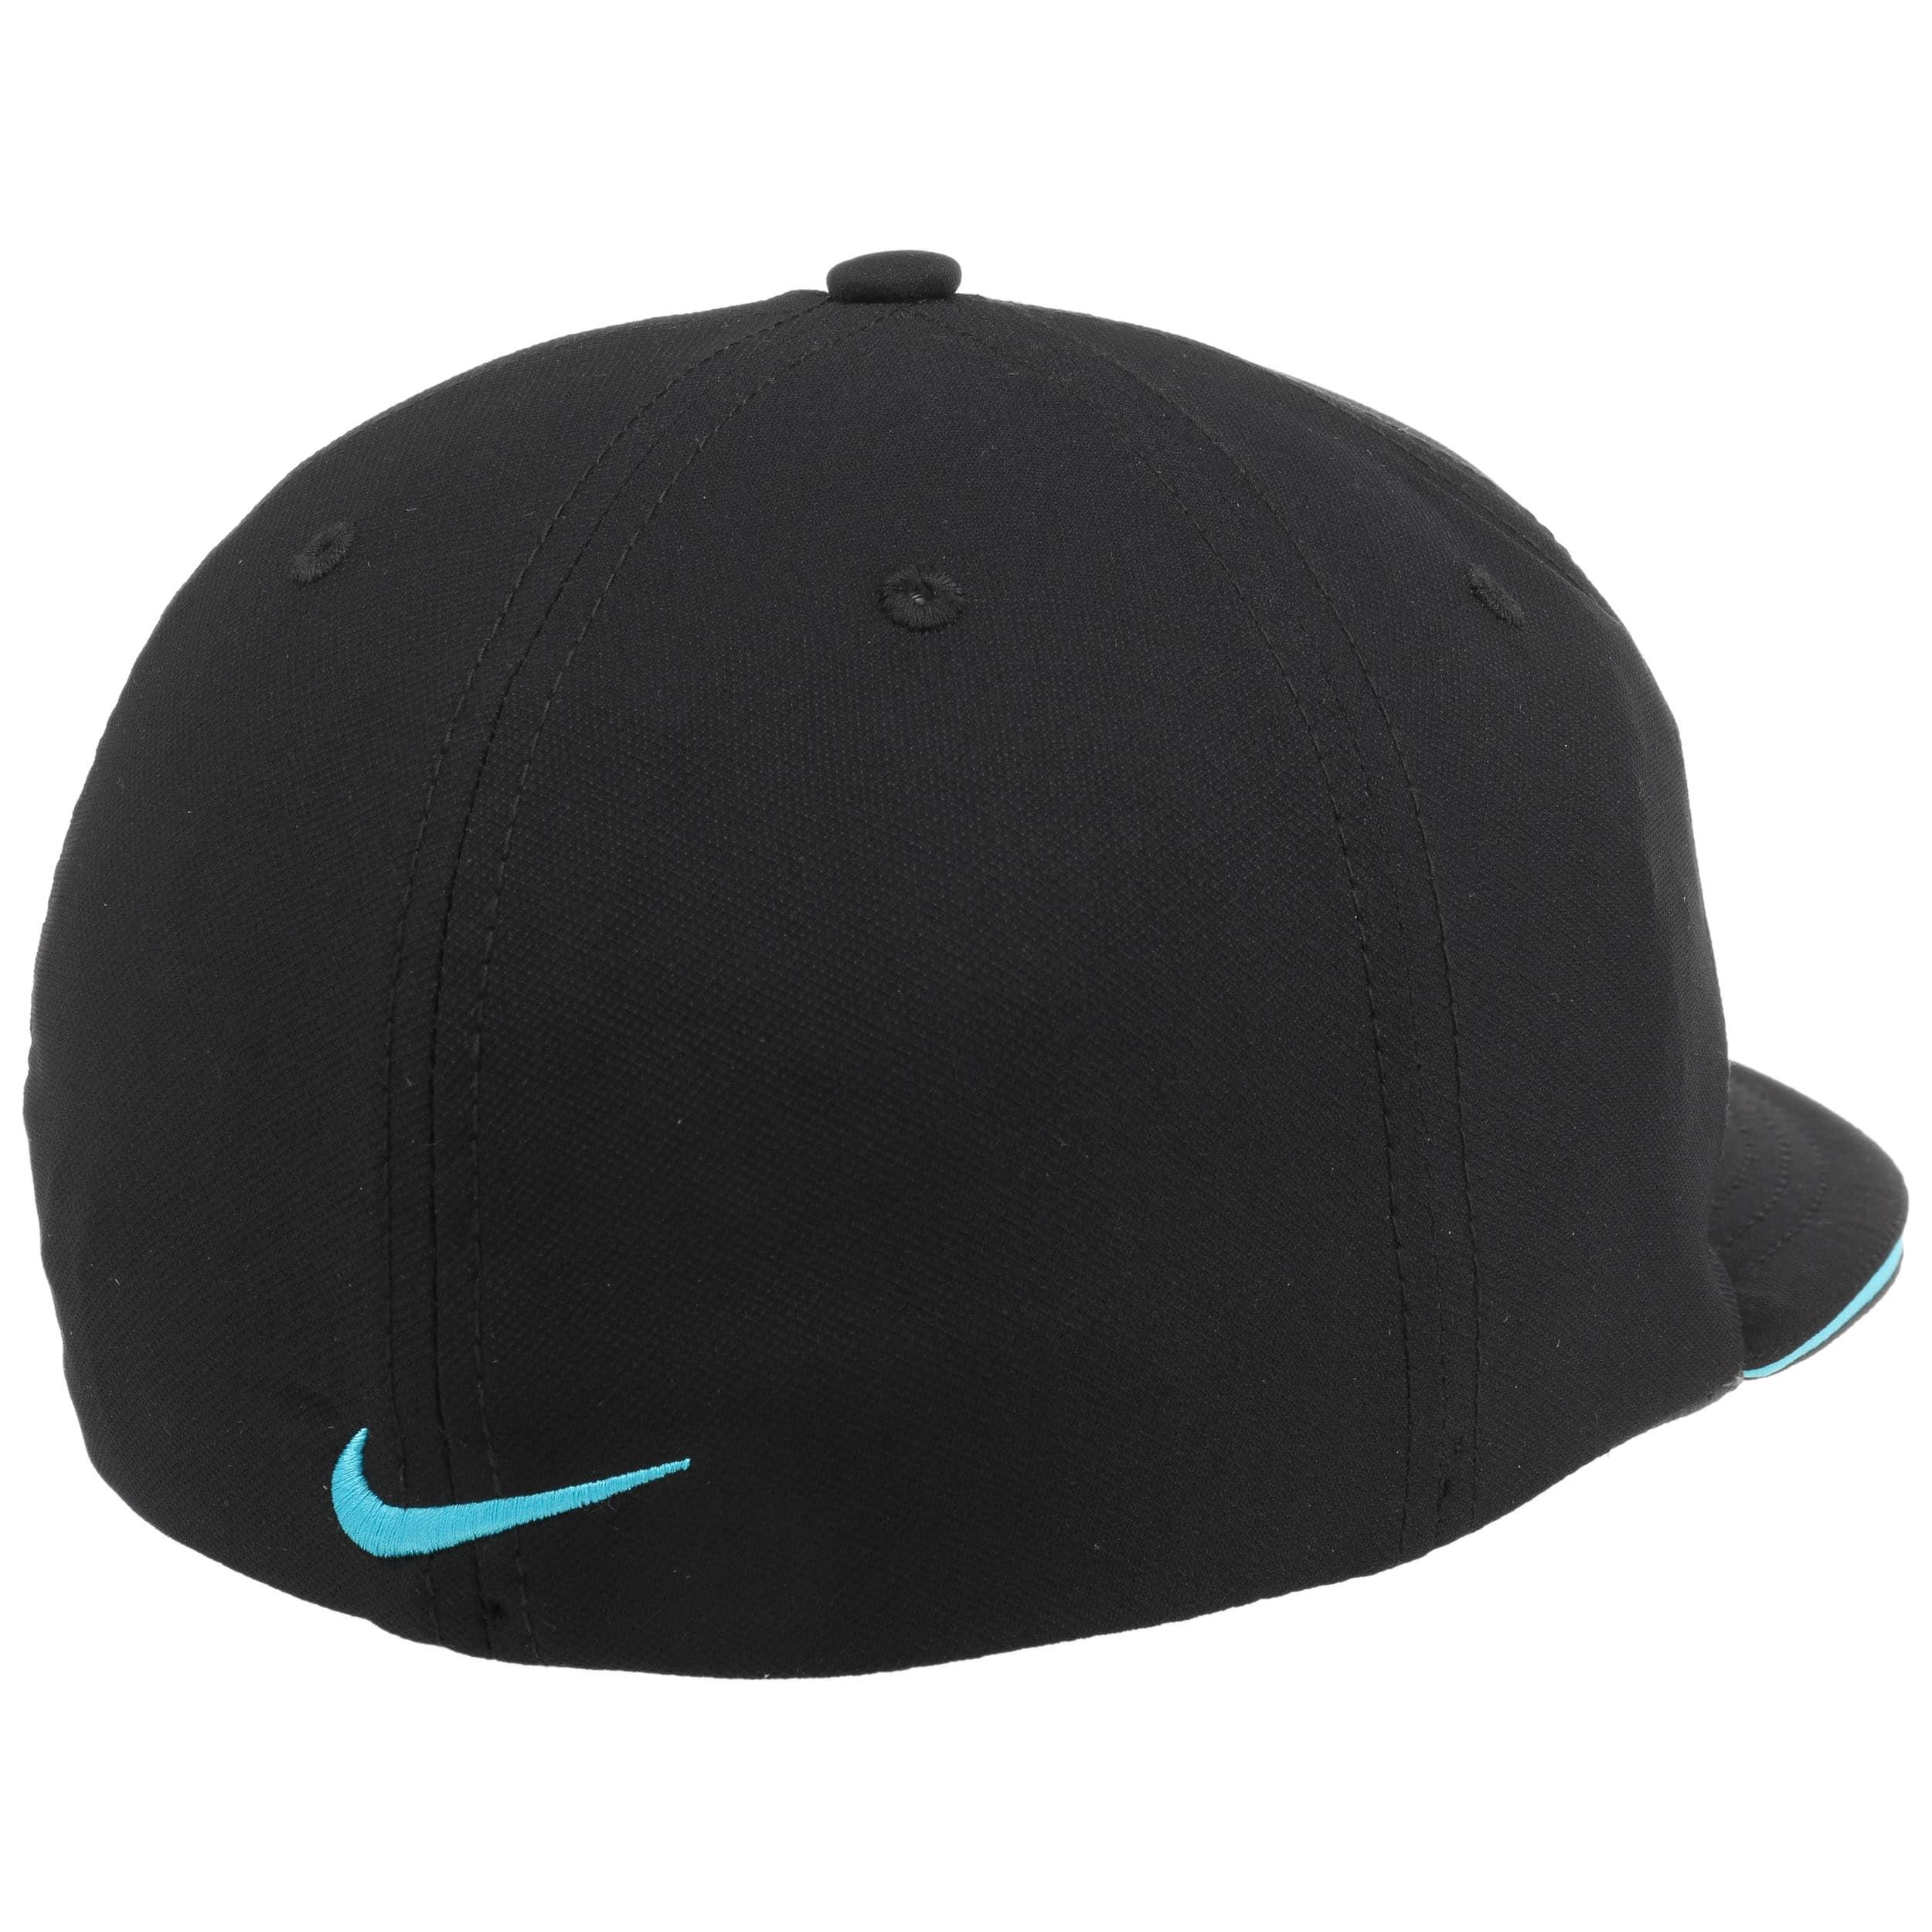 c6953f8e867de Gorra True Statement Flexfit Cap by Nike - Gorras - sombreroshop.es